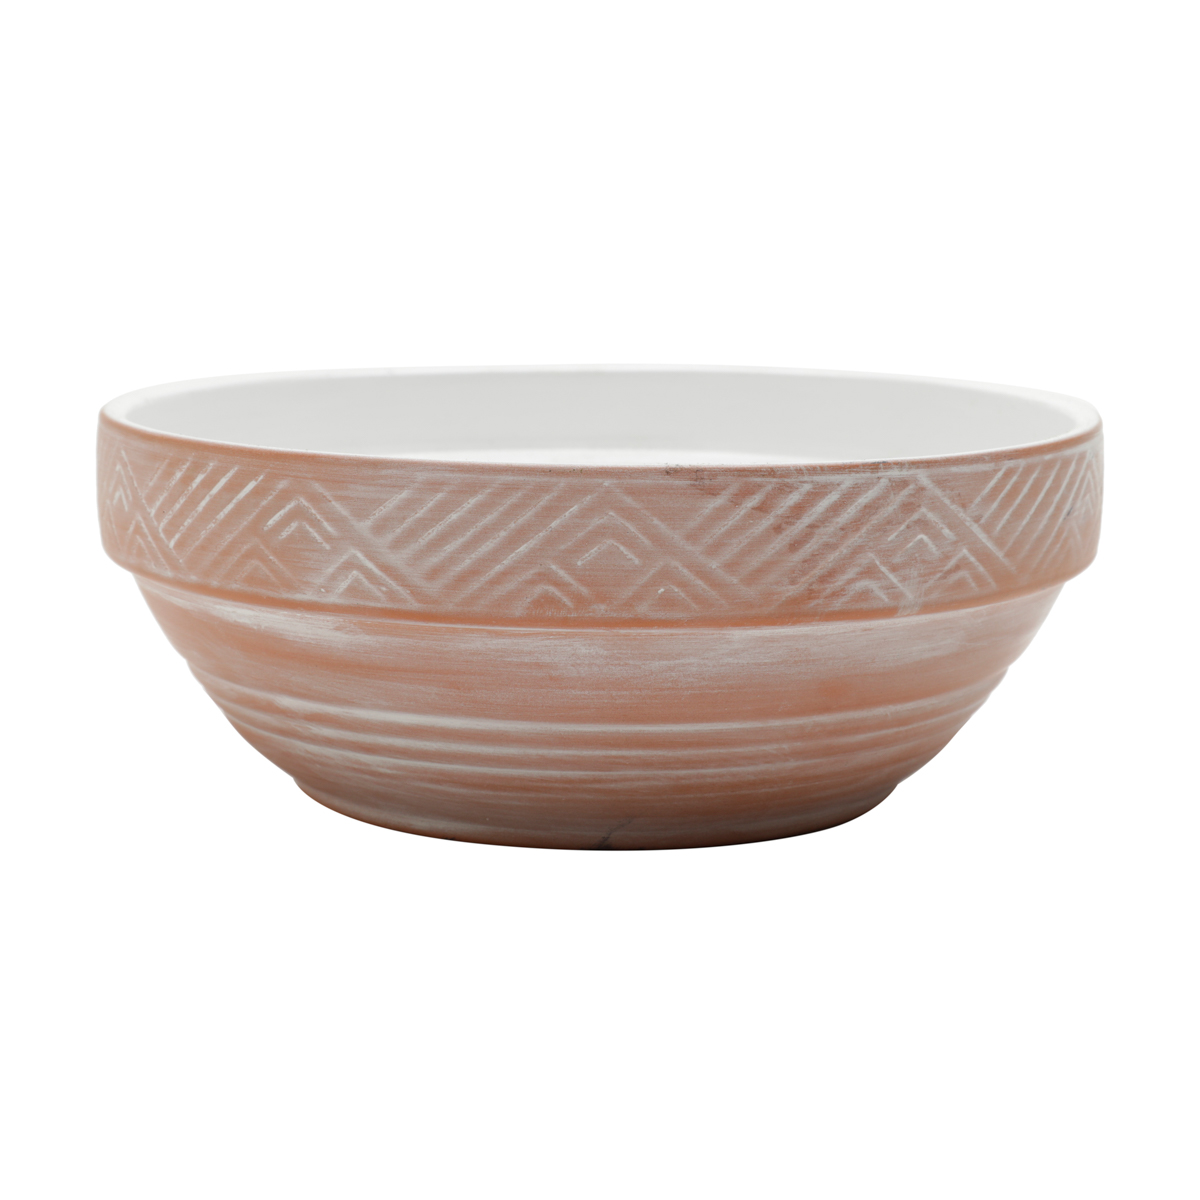 Vaso cerâmica terracota Ethinic Patterns bege e branco 17,5x6,5cm Urban